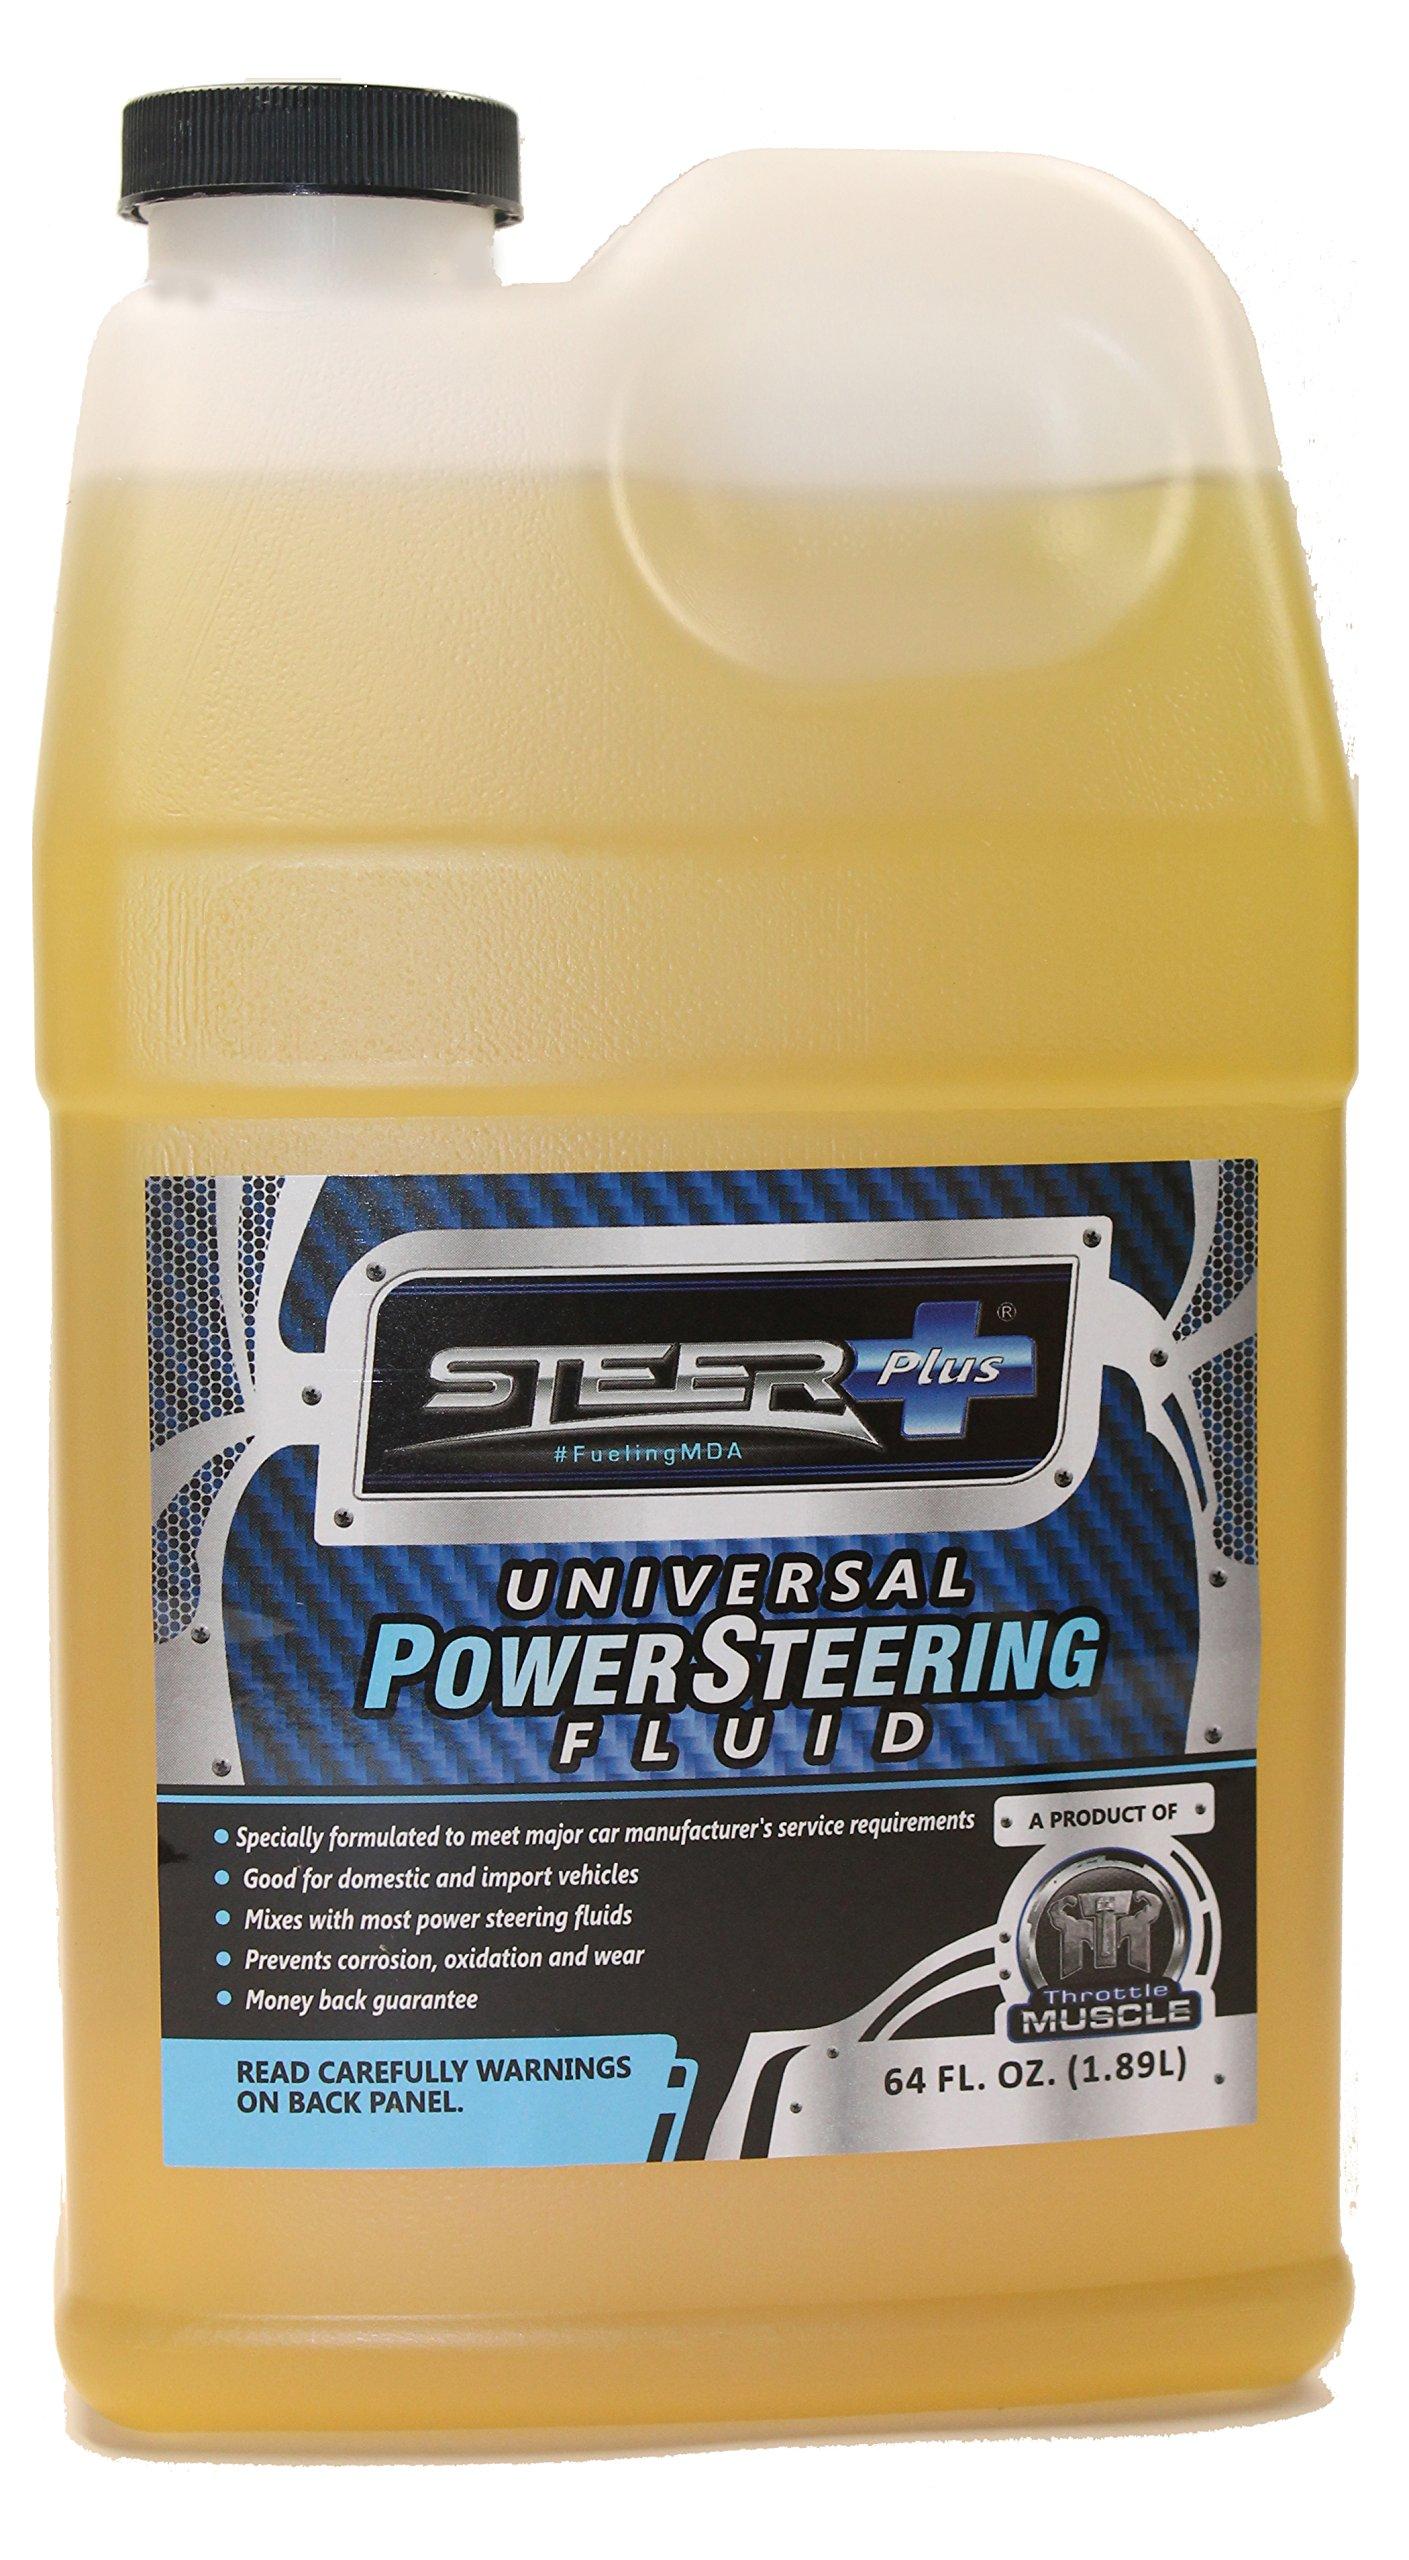 Throttle Muscle TM7587 - Steer+ Plus Universal Power Steering Fluid 64 Oz Import and Domestic Universal Heavy Duty